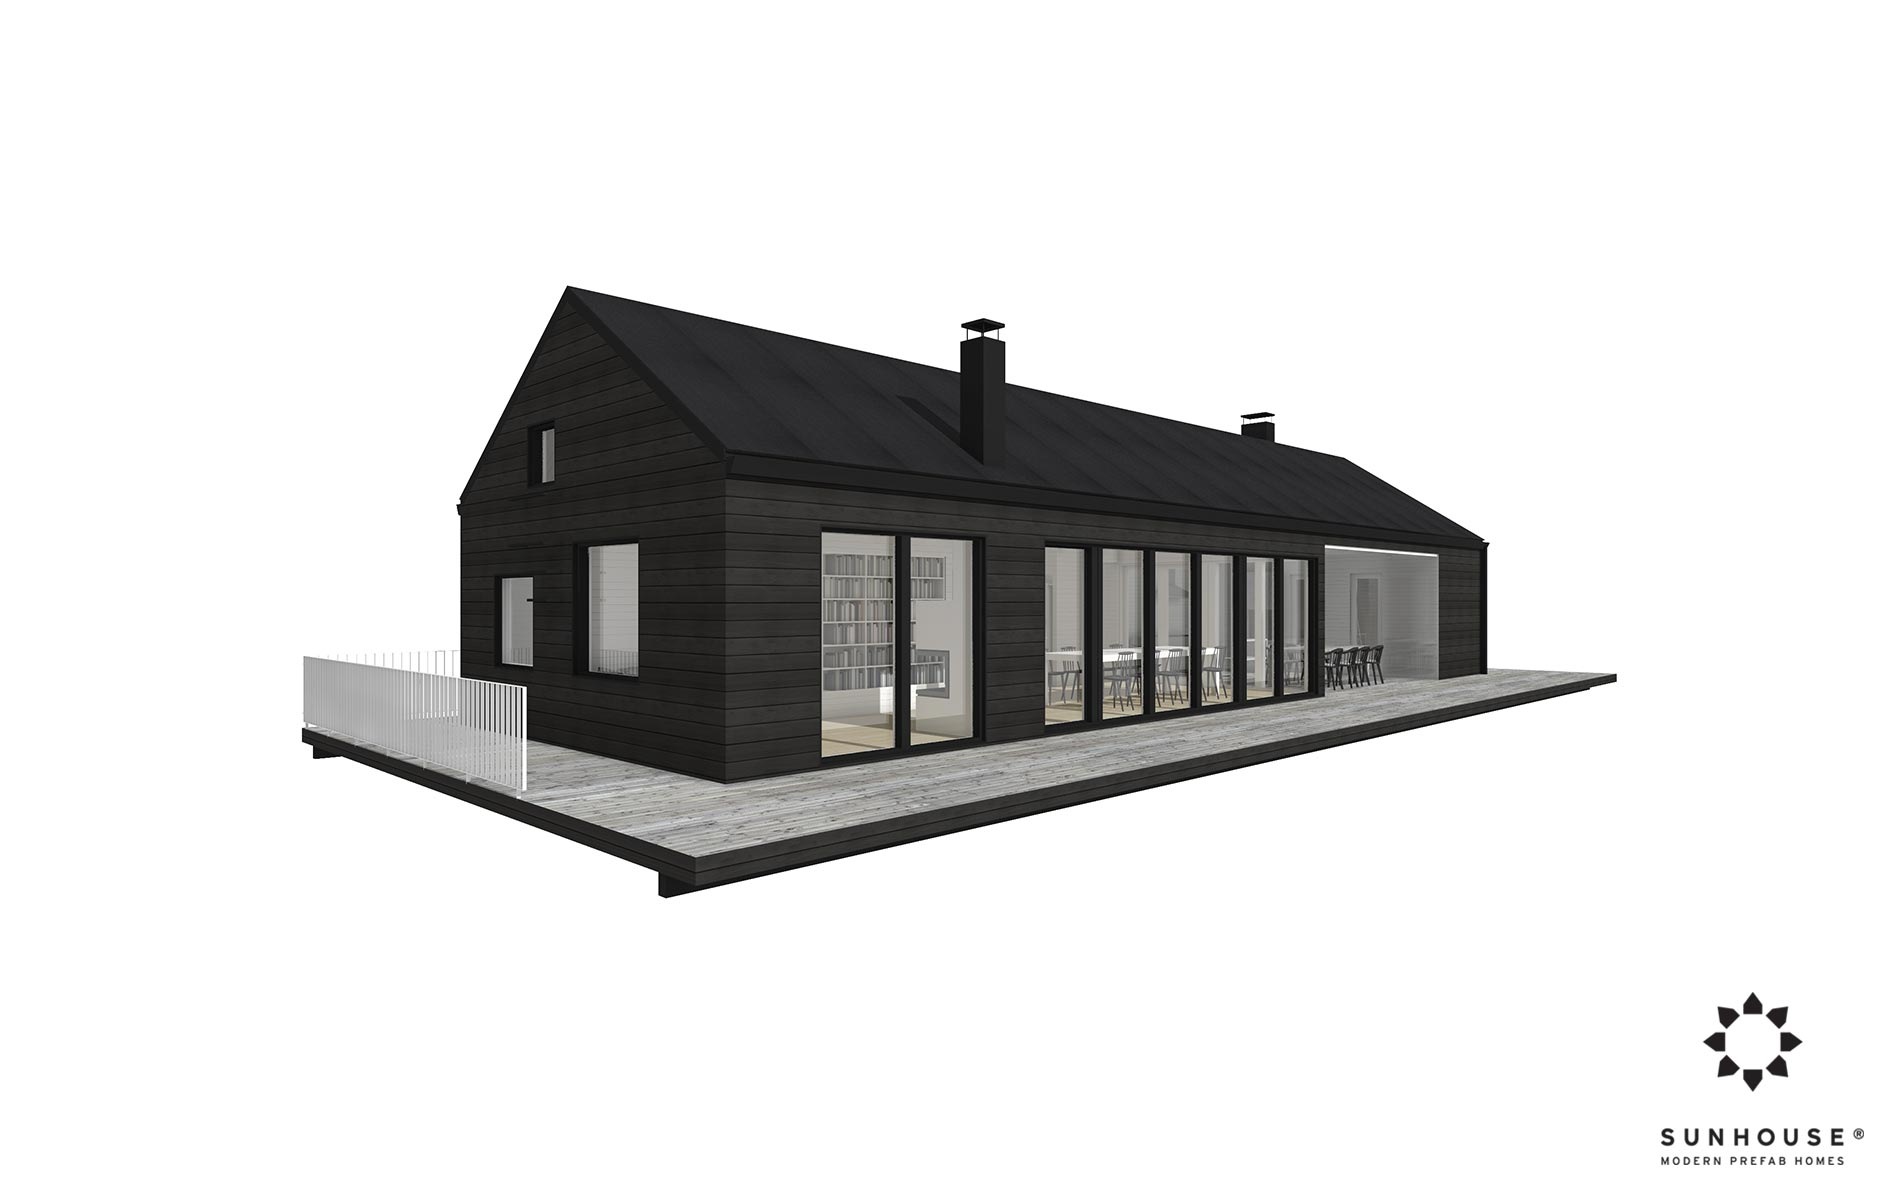 Sunhouse S1319 - moderni huvila